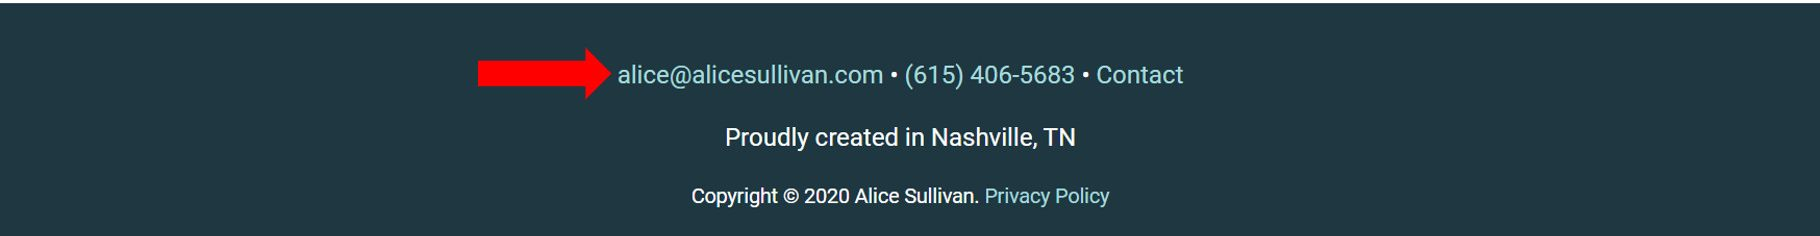 Start Freelance Writing   CTA Bottom of Alice Sullivan's Website